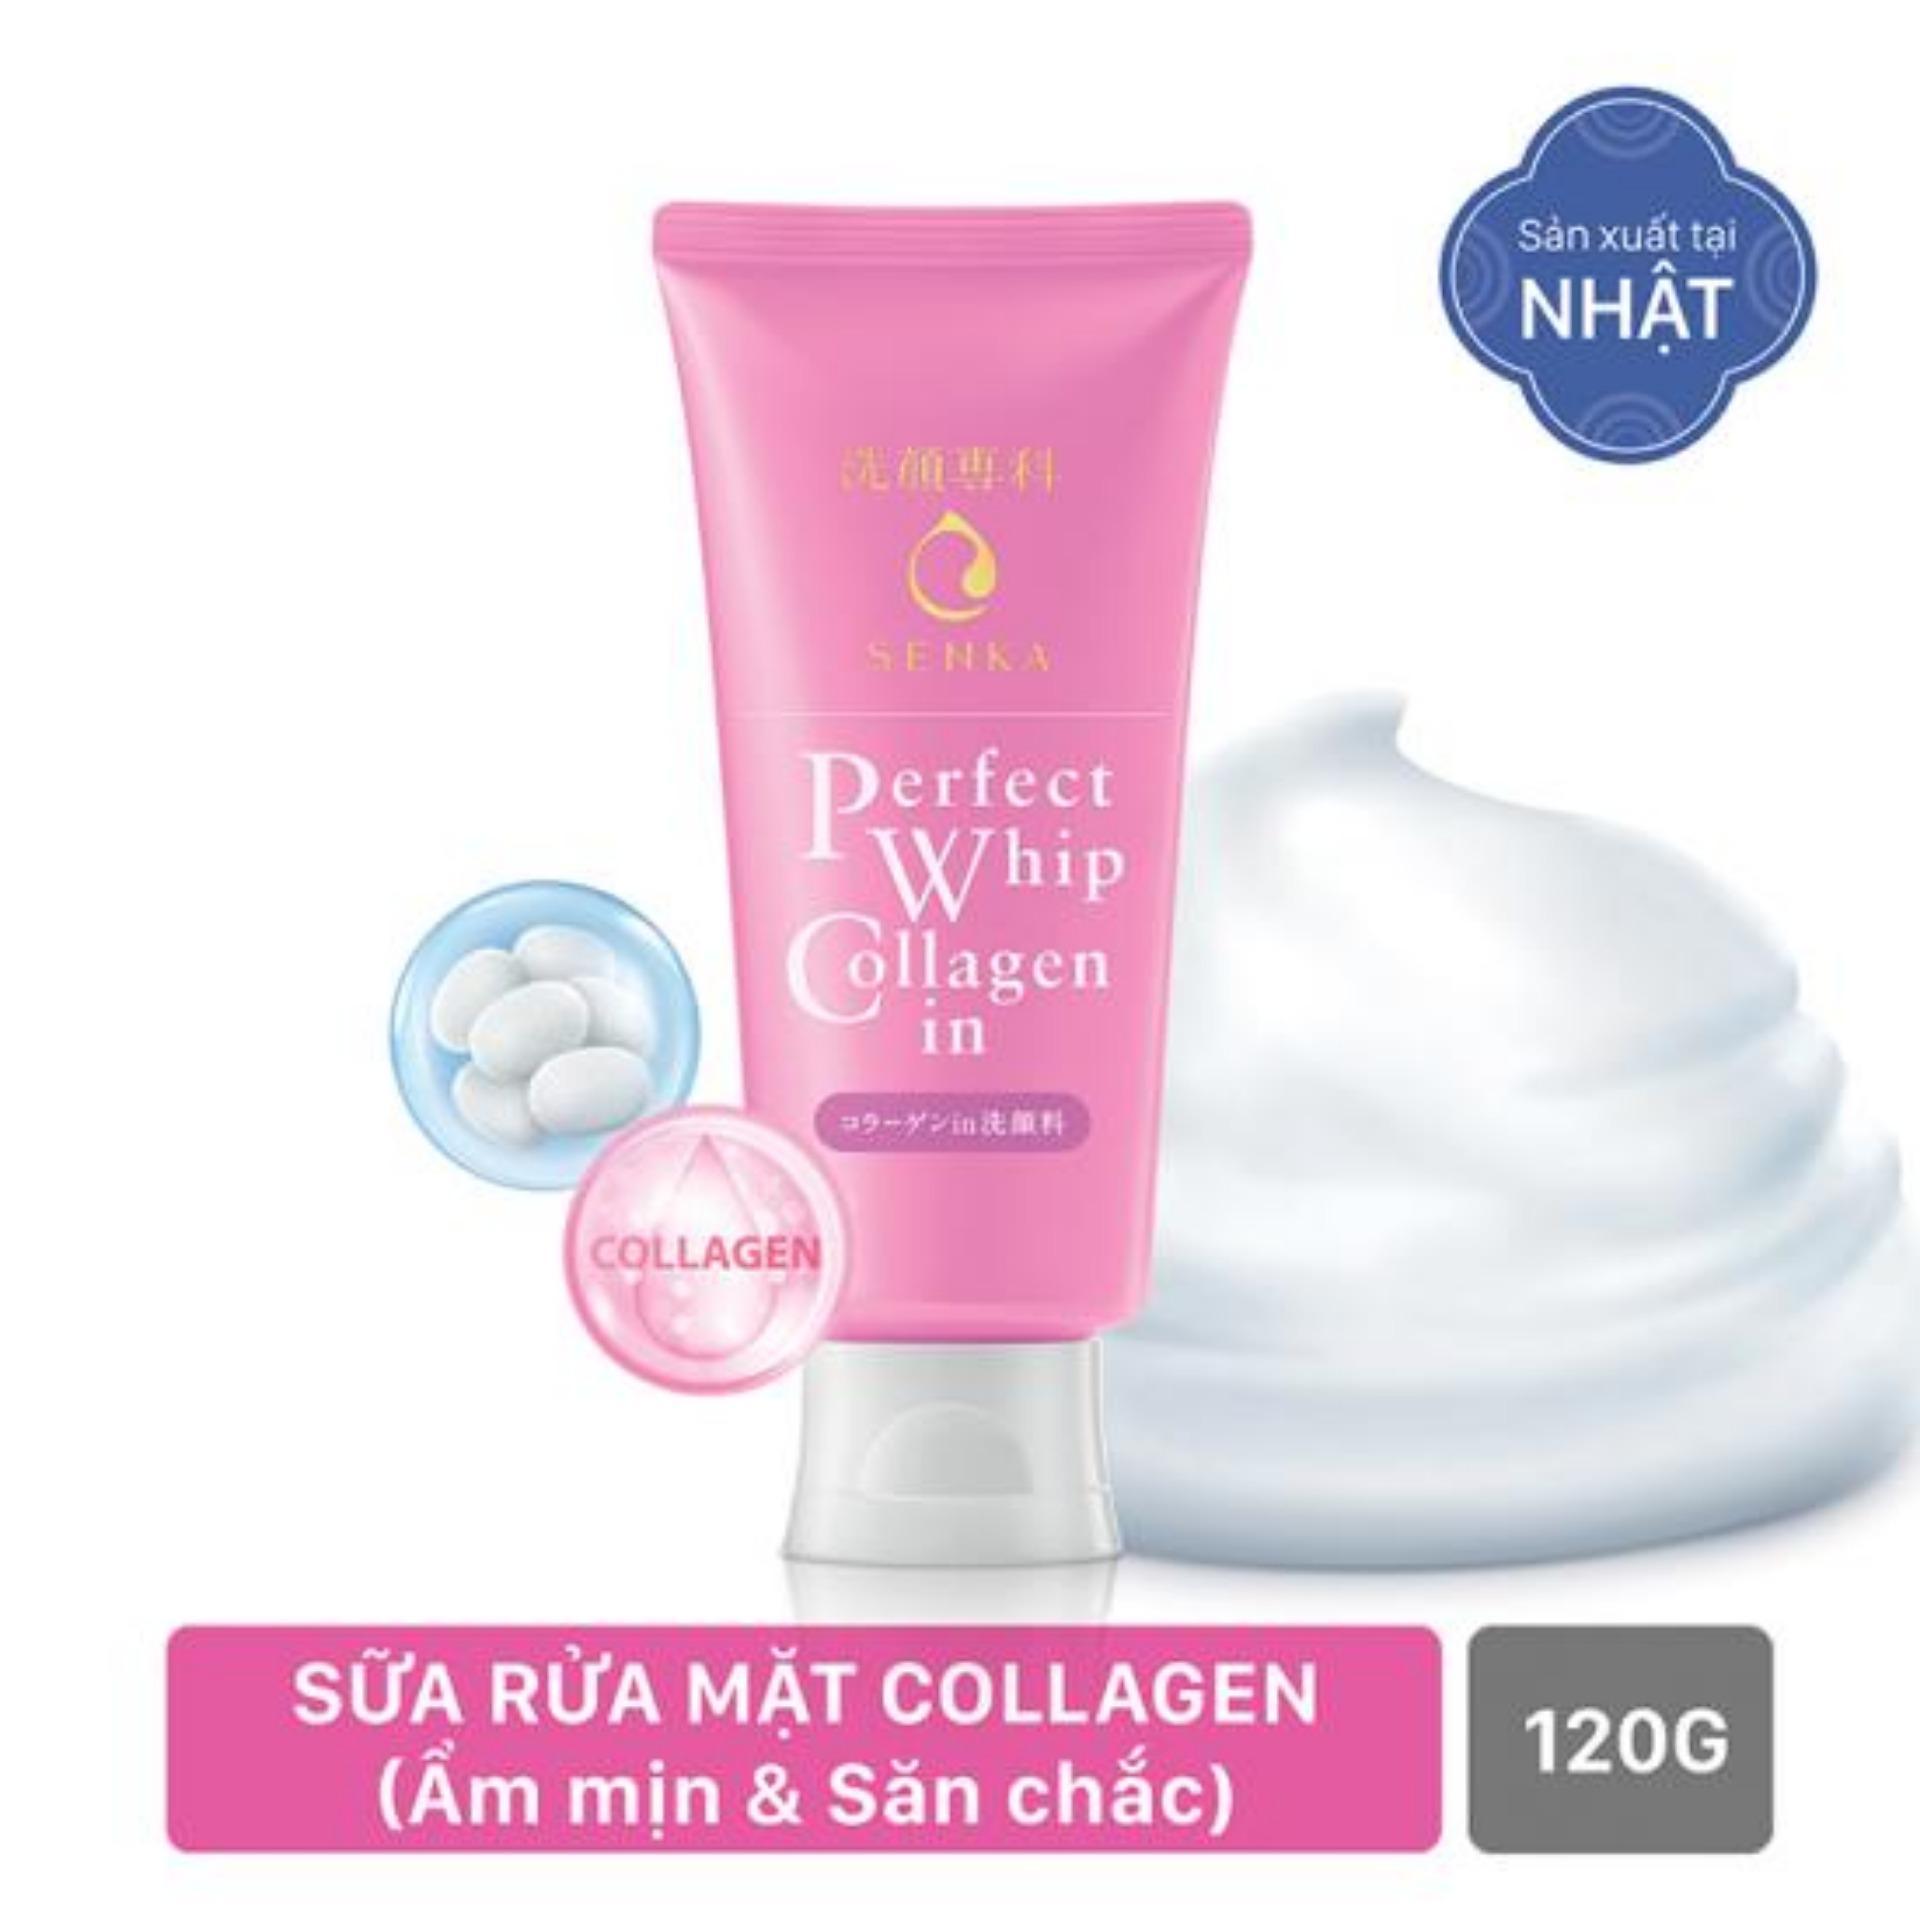 Hình ảnh Sữa Rửa Mặt Collagen Senka Perfect Whip Collagen In 120g (code 14836)